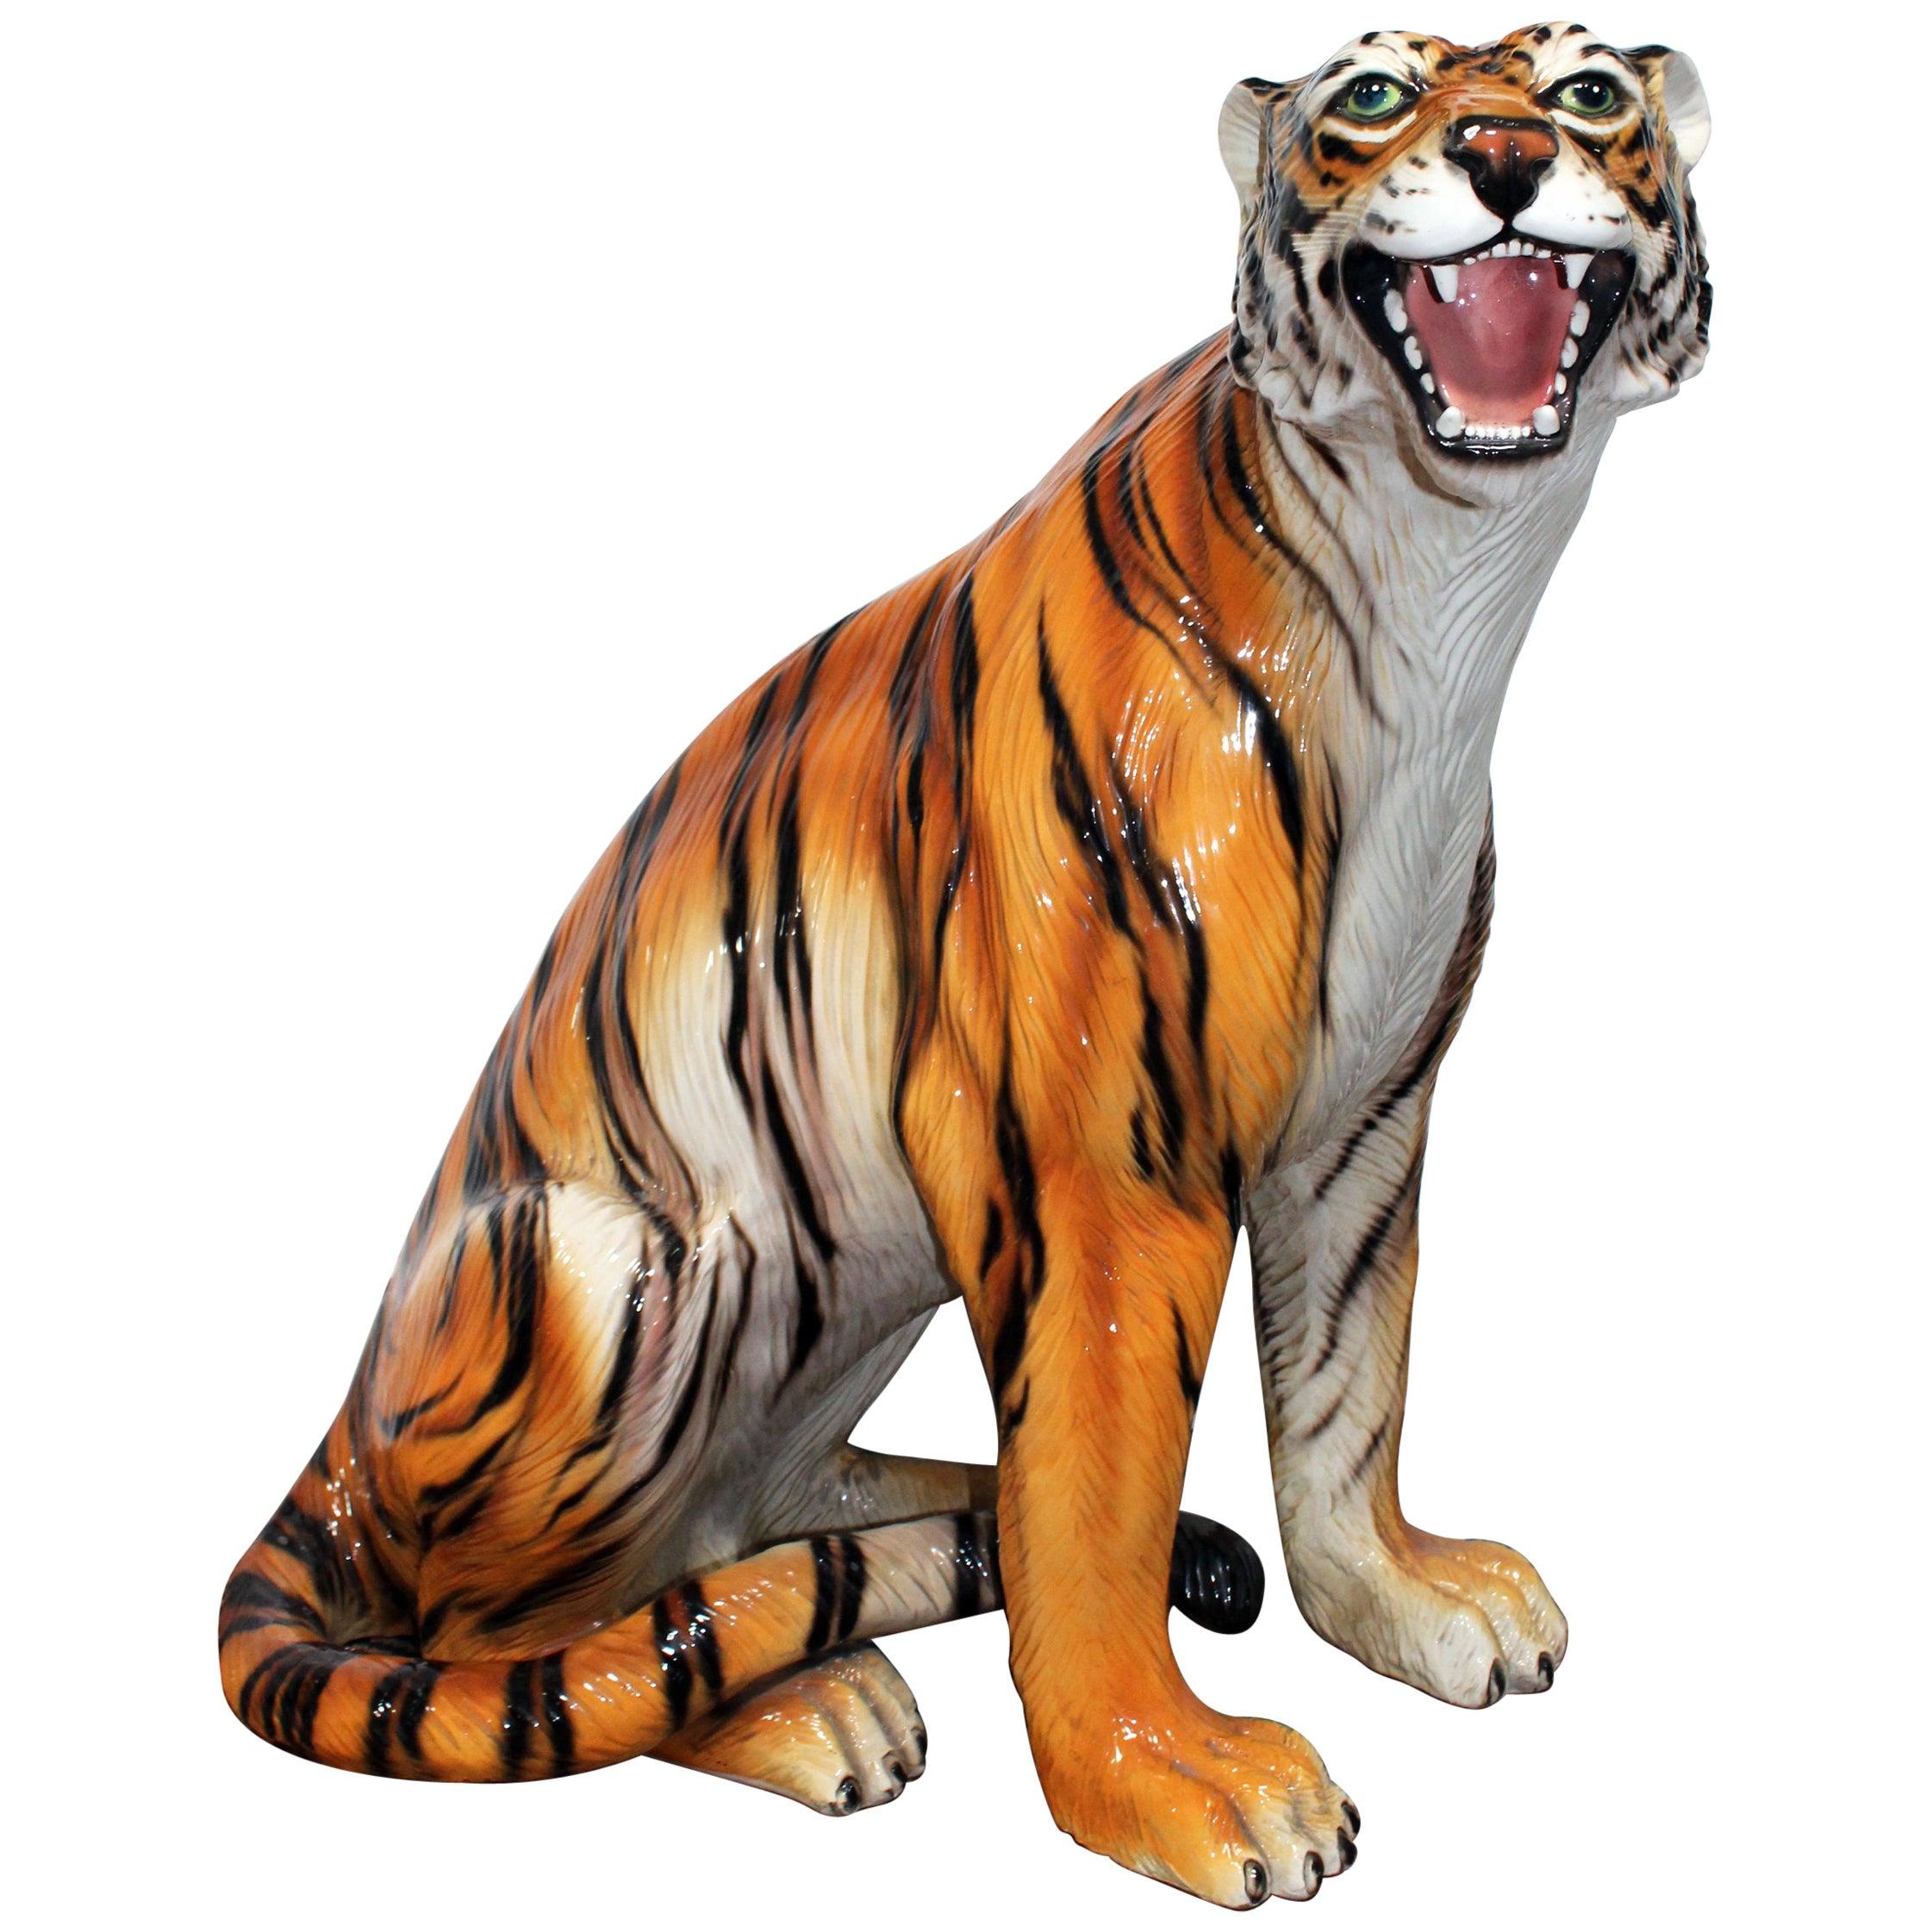 1980s Spanish Hand Painted Glazed Ceramic Tiger Sculpture